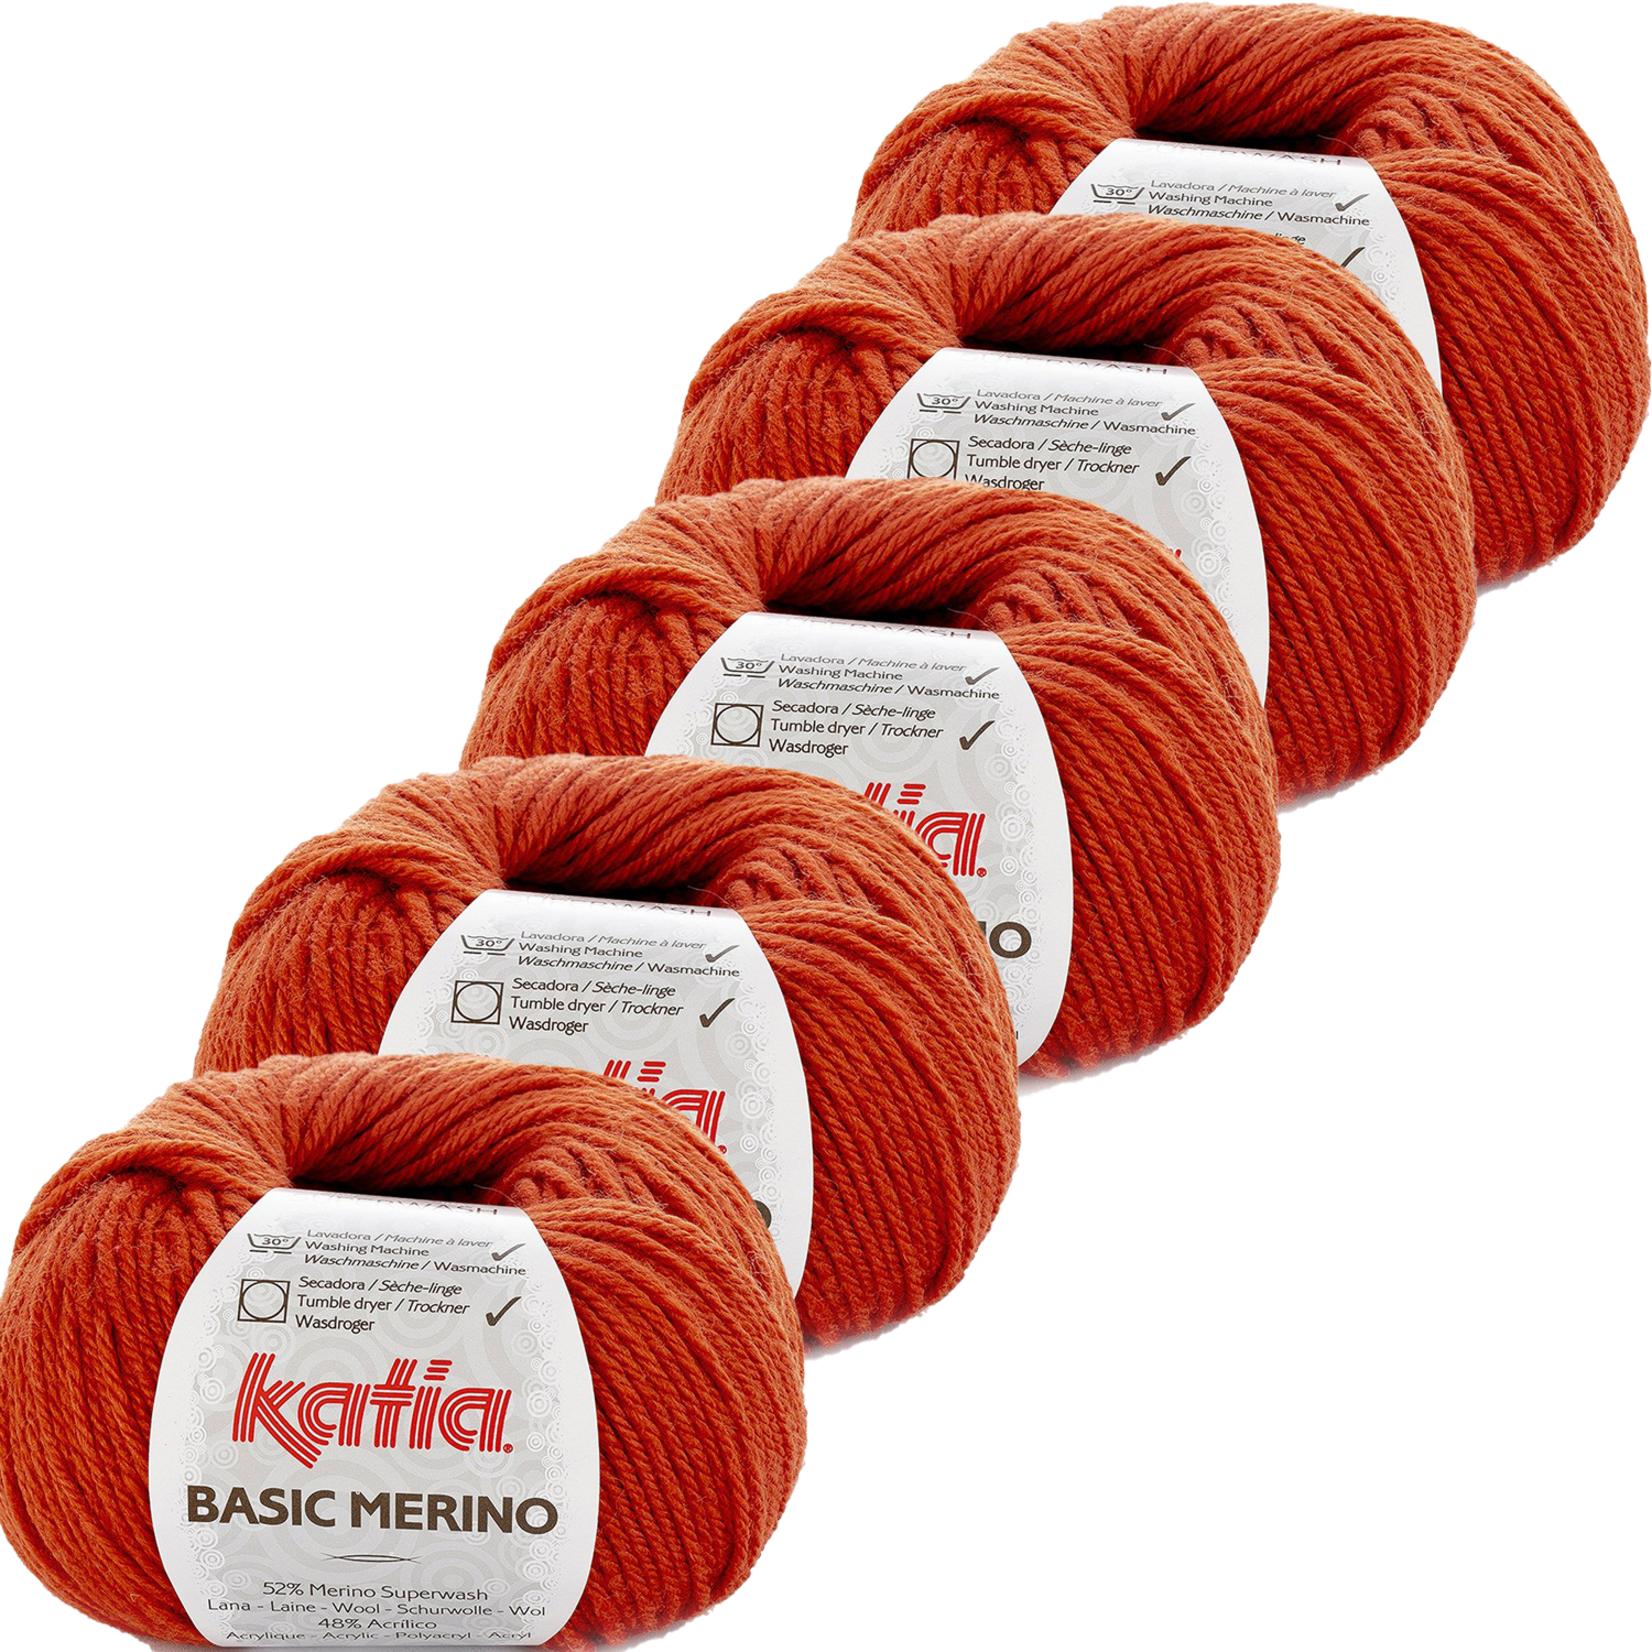 Katia Basic Merino - kleur 20_Dieporanje - bundel 5 bollen 50 gr.  van 120 m.